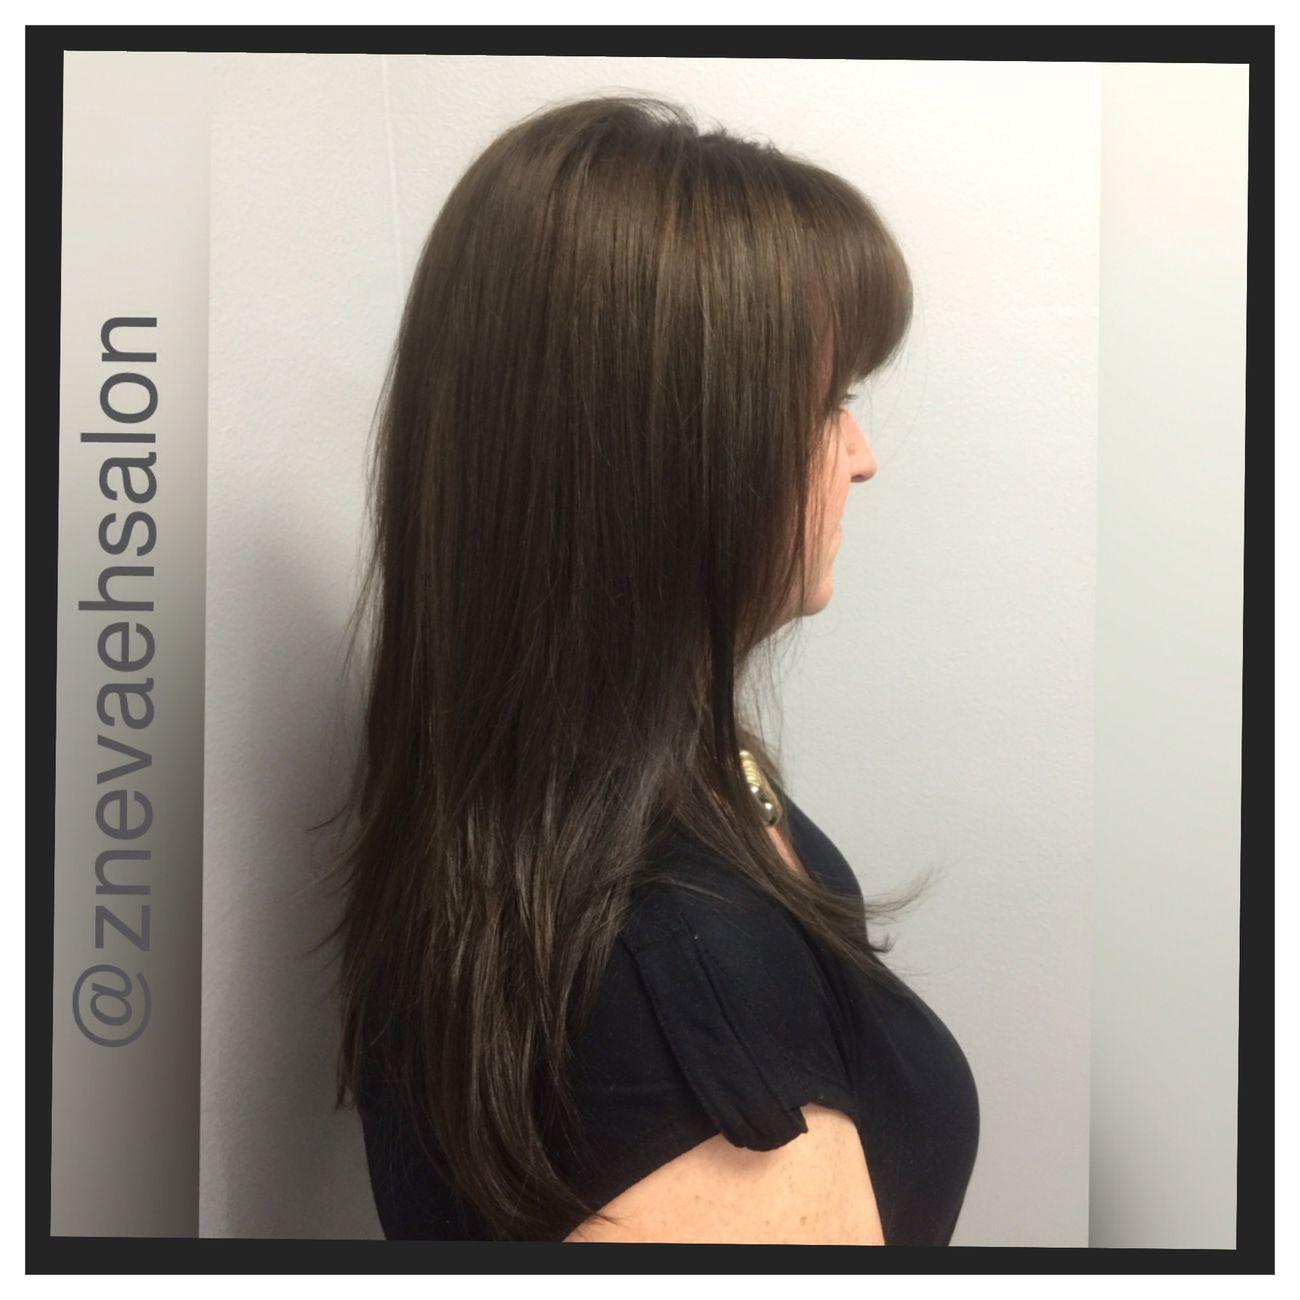 Beautiful Brown Haircolor @znevaehsalon Check This Out Inoa Z Nevaeh Salon L'Oreal Professionnel Hair Style Tecni.art Vitaminoaox